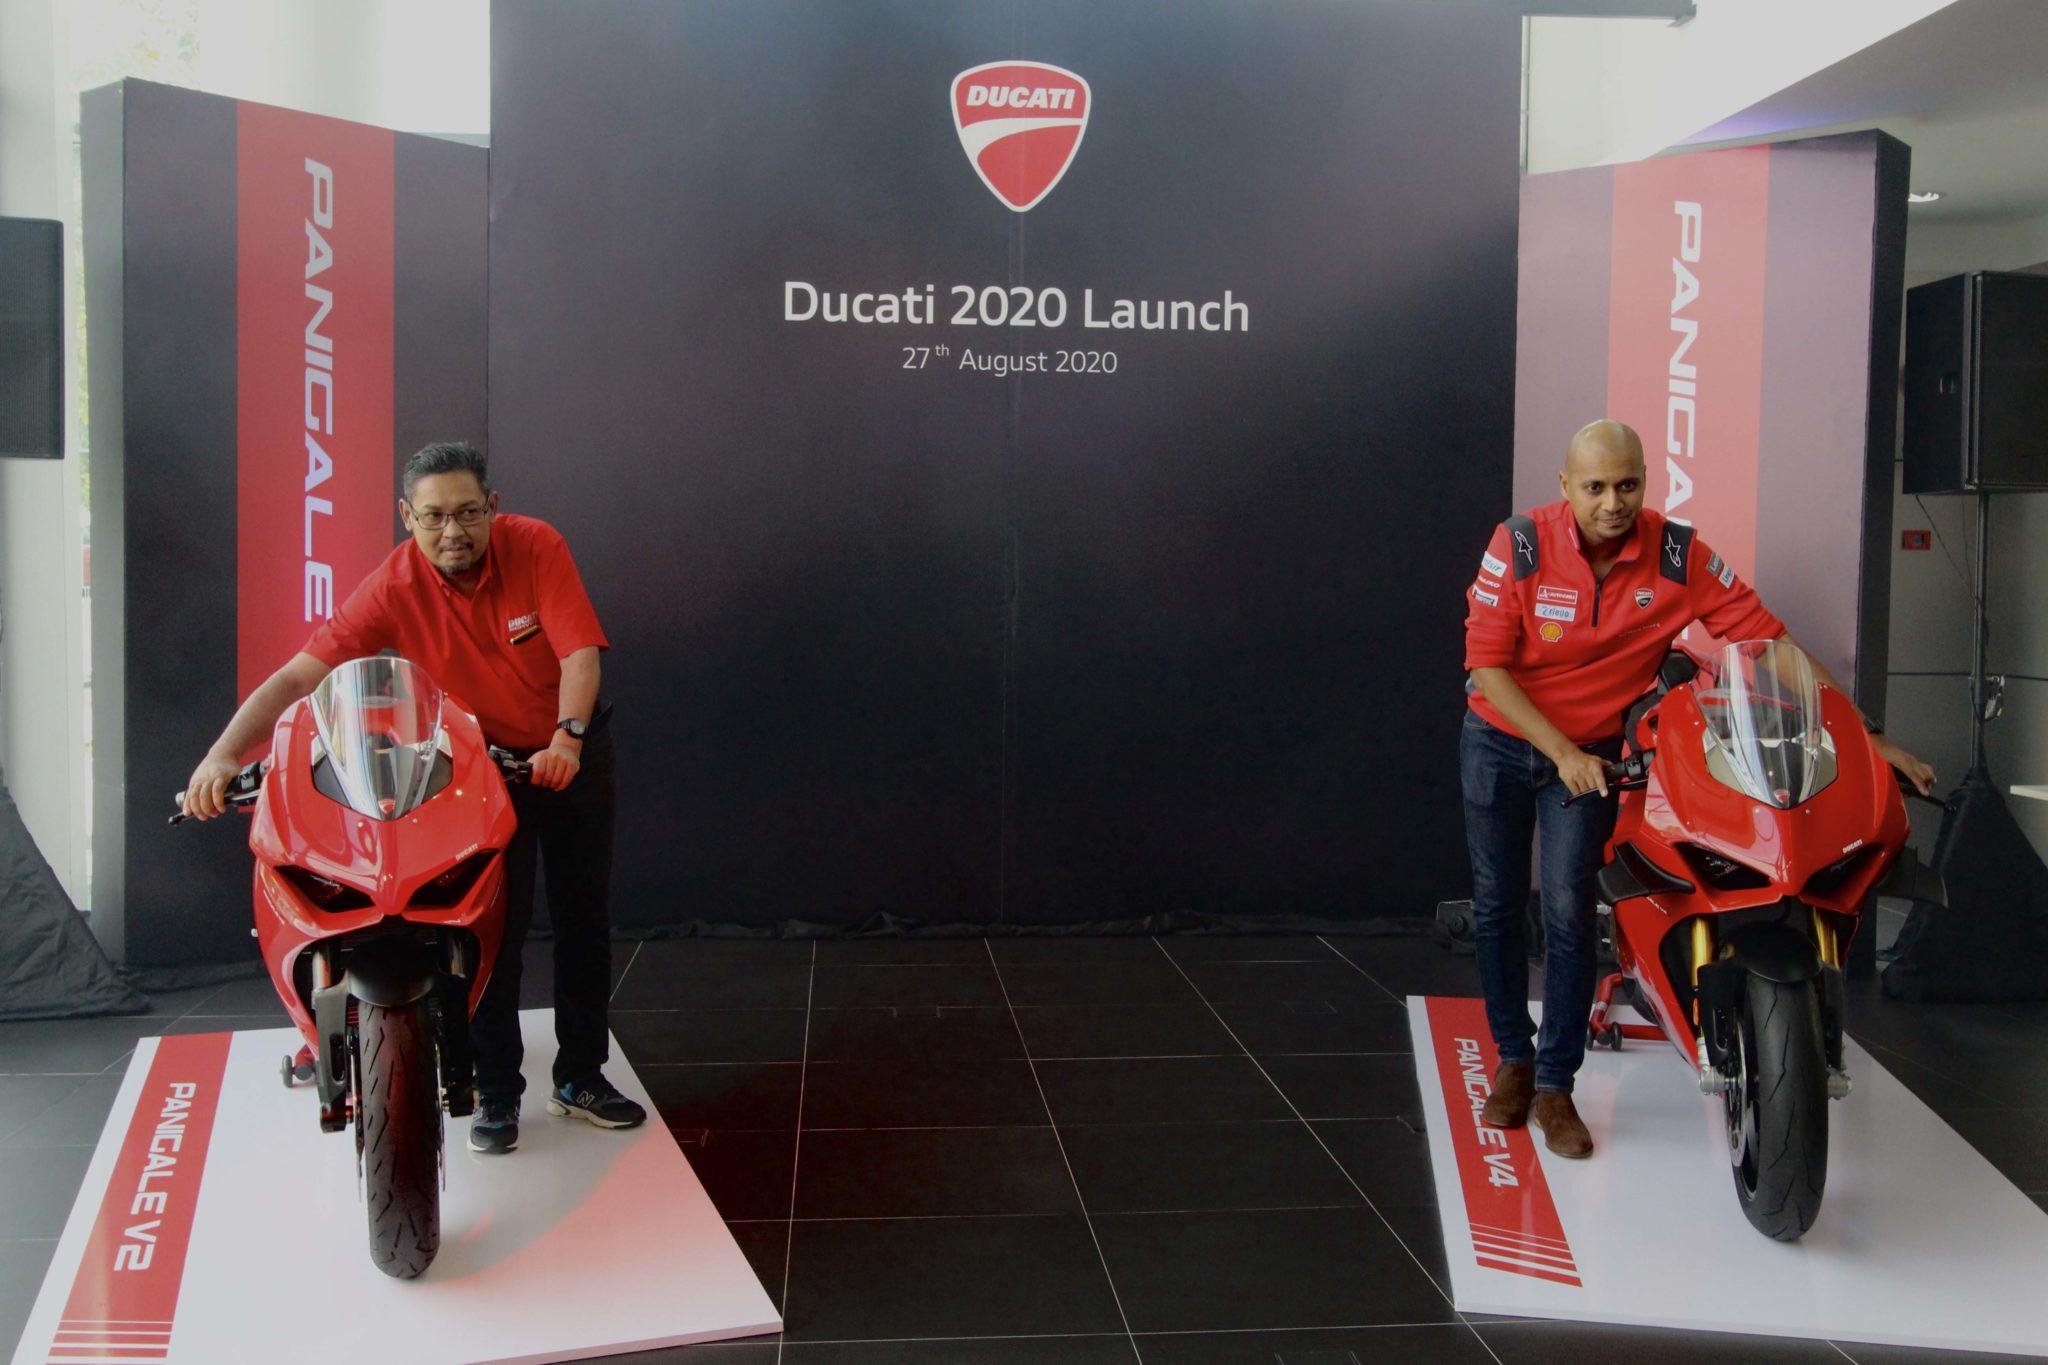 Ducati Panigale V4, V4s, Panigale V2 & Scrambler Icon Dark Launched in Malaysia